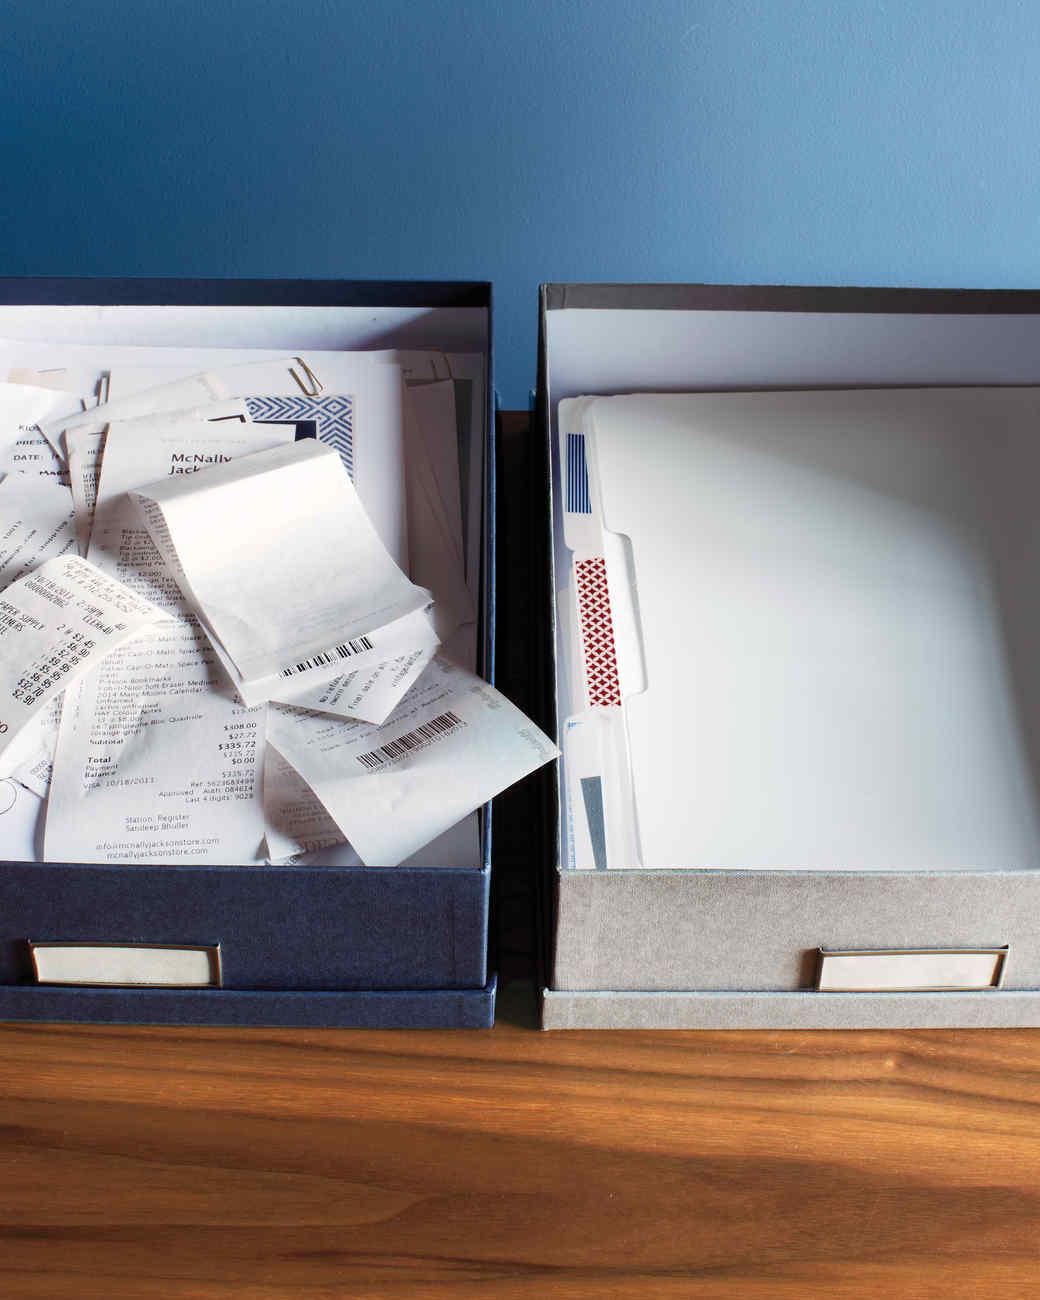 desk-detail-organizing-257-md110720.jpg